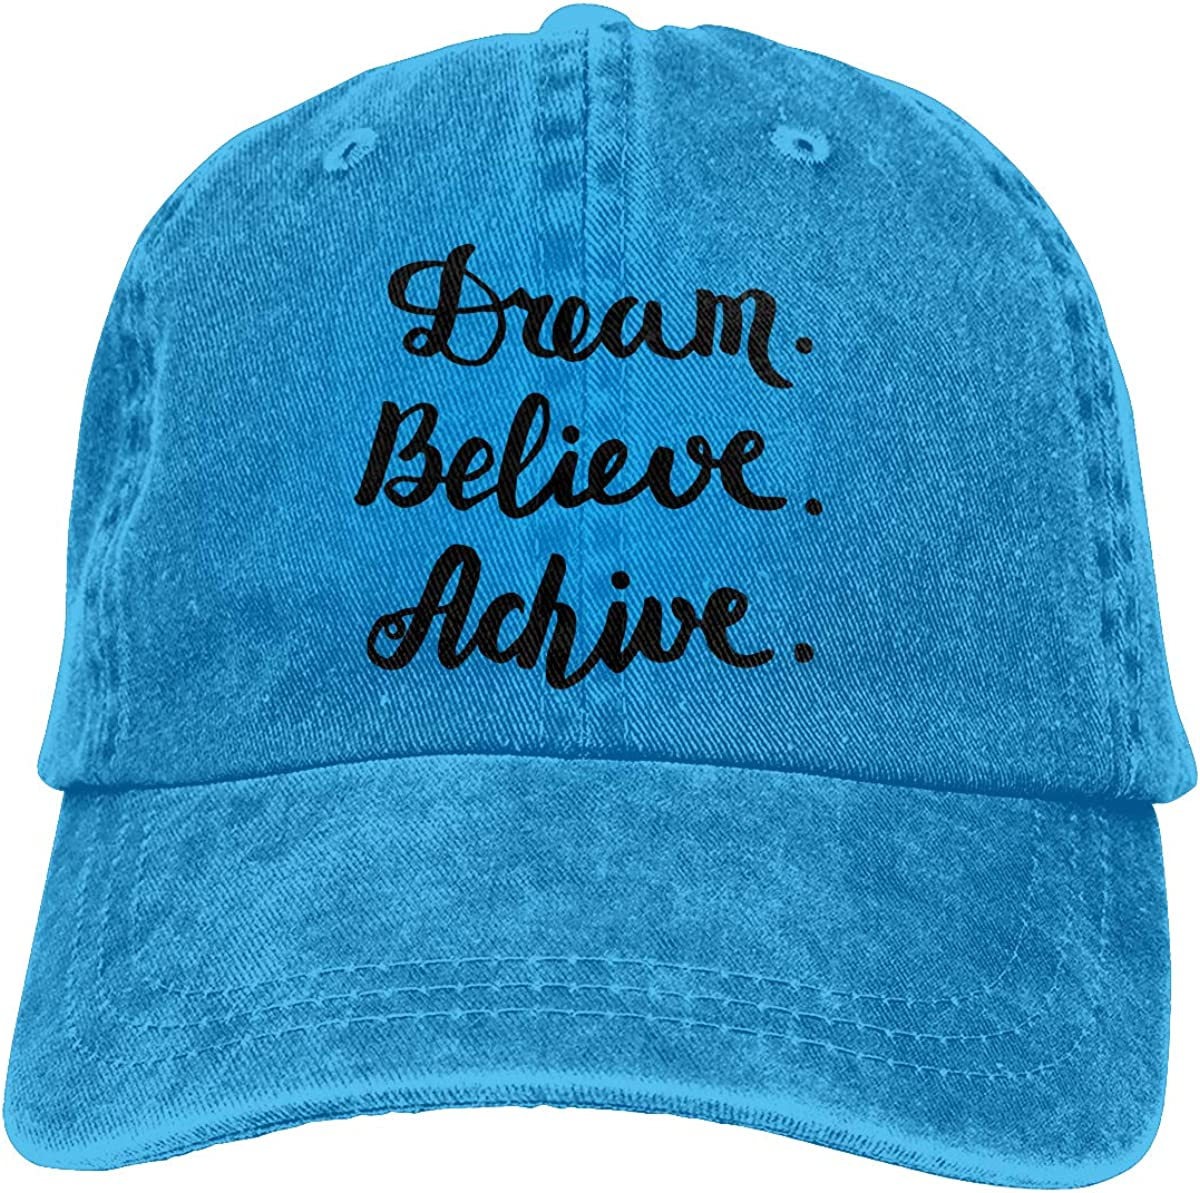 PMGM-C Dream Believe Achieve Unisex Trendy Cowboy Casquette Adjustable Baseball Cap